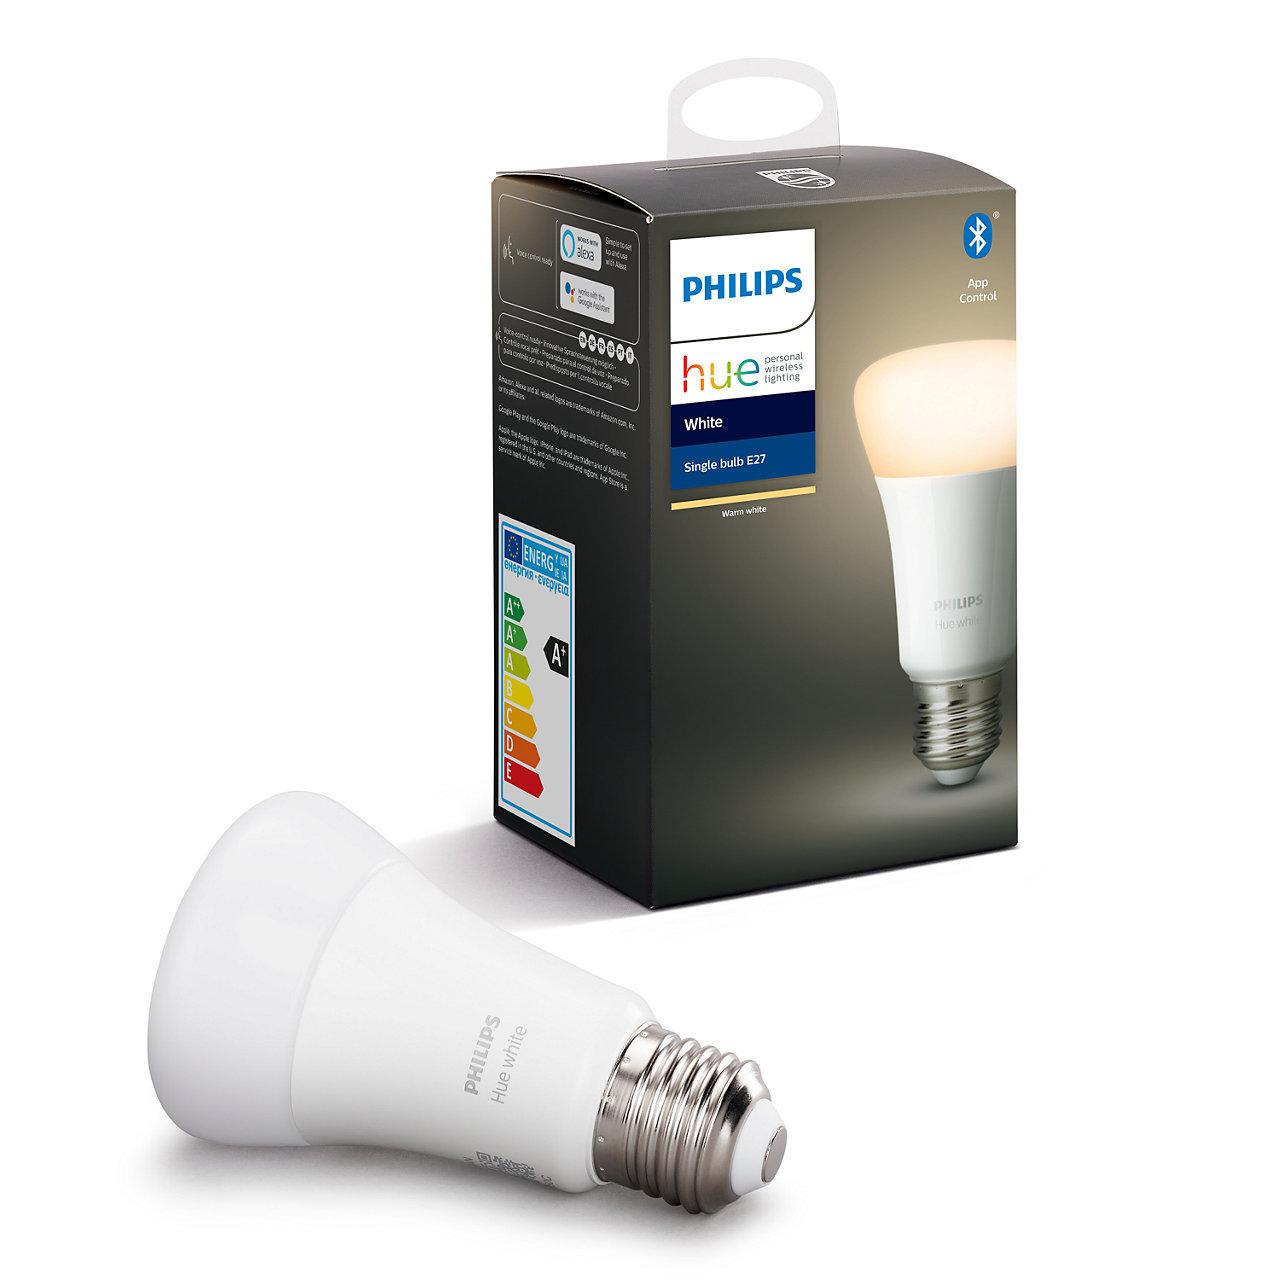 White - Ampoule 9.5W E27 x1